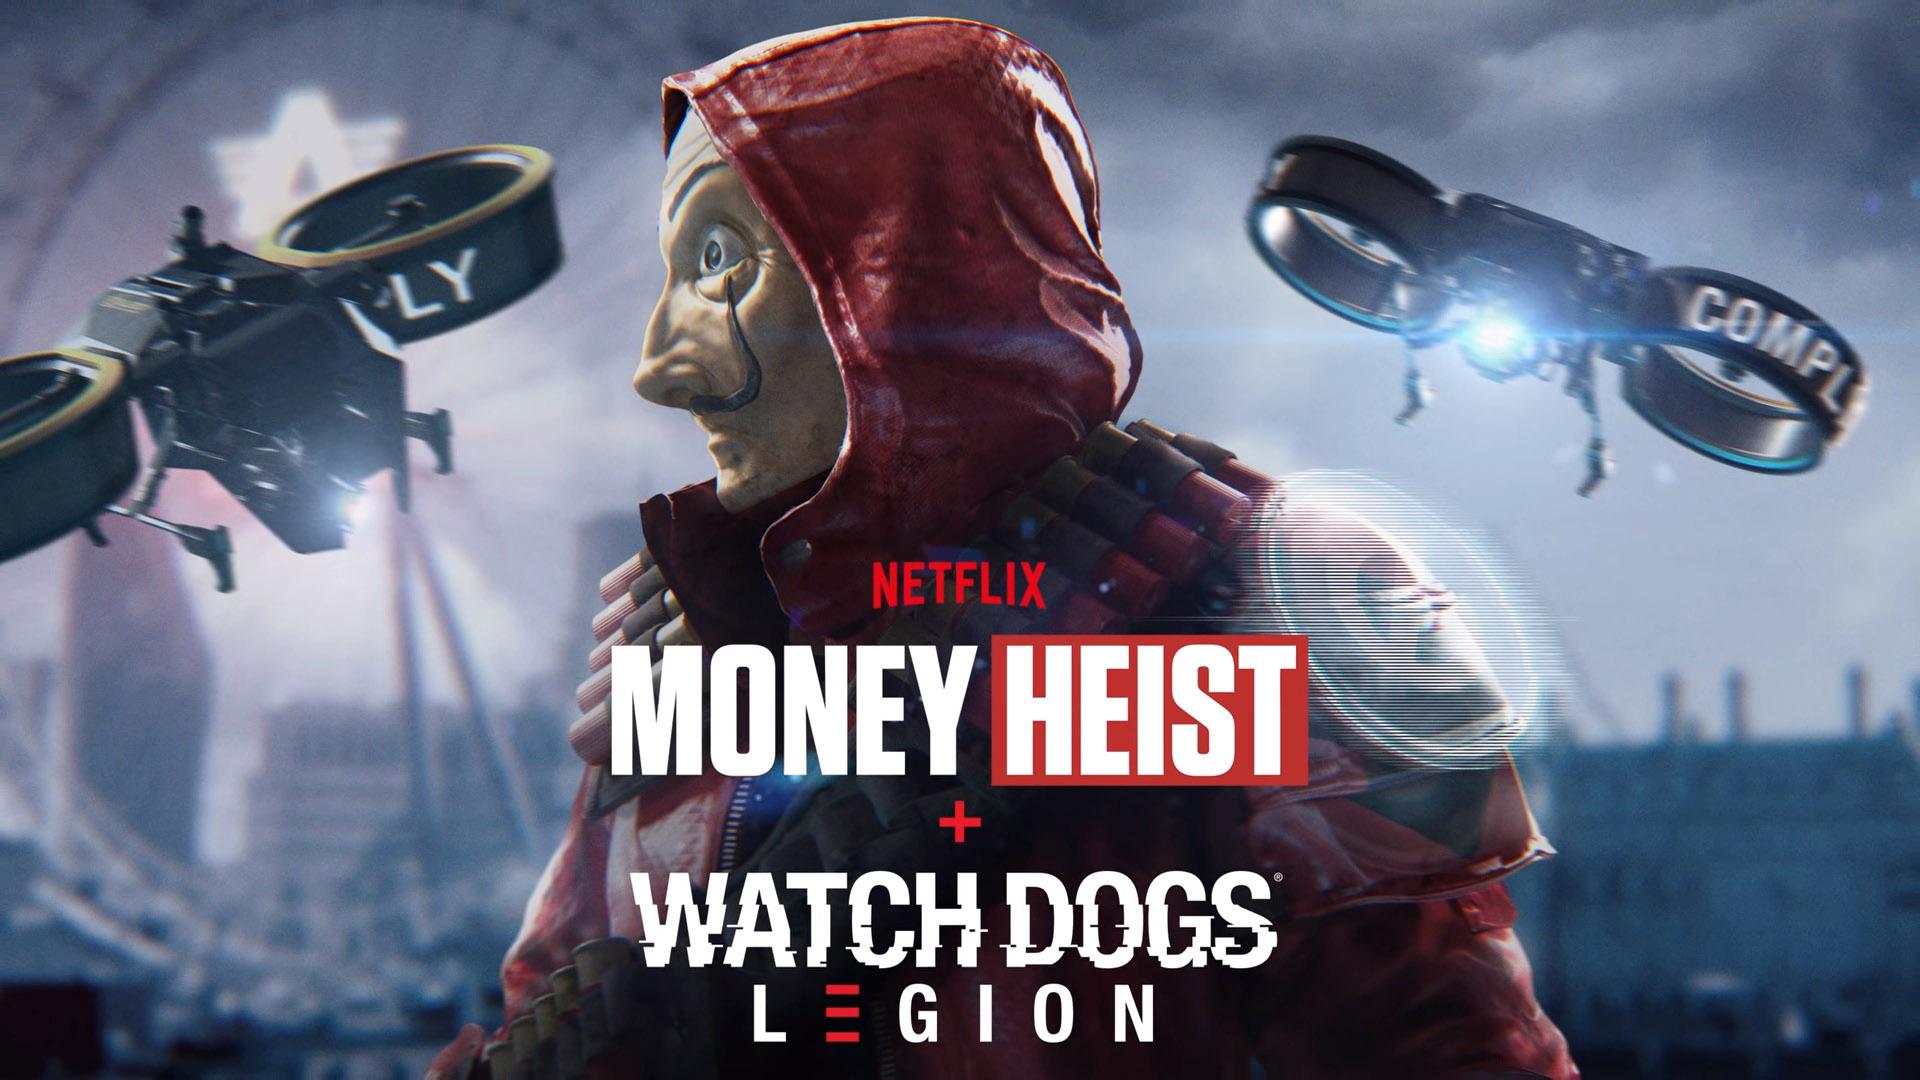 Watch-Dogs-Money-Heist-